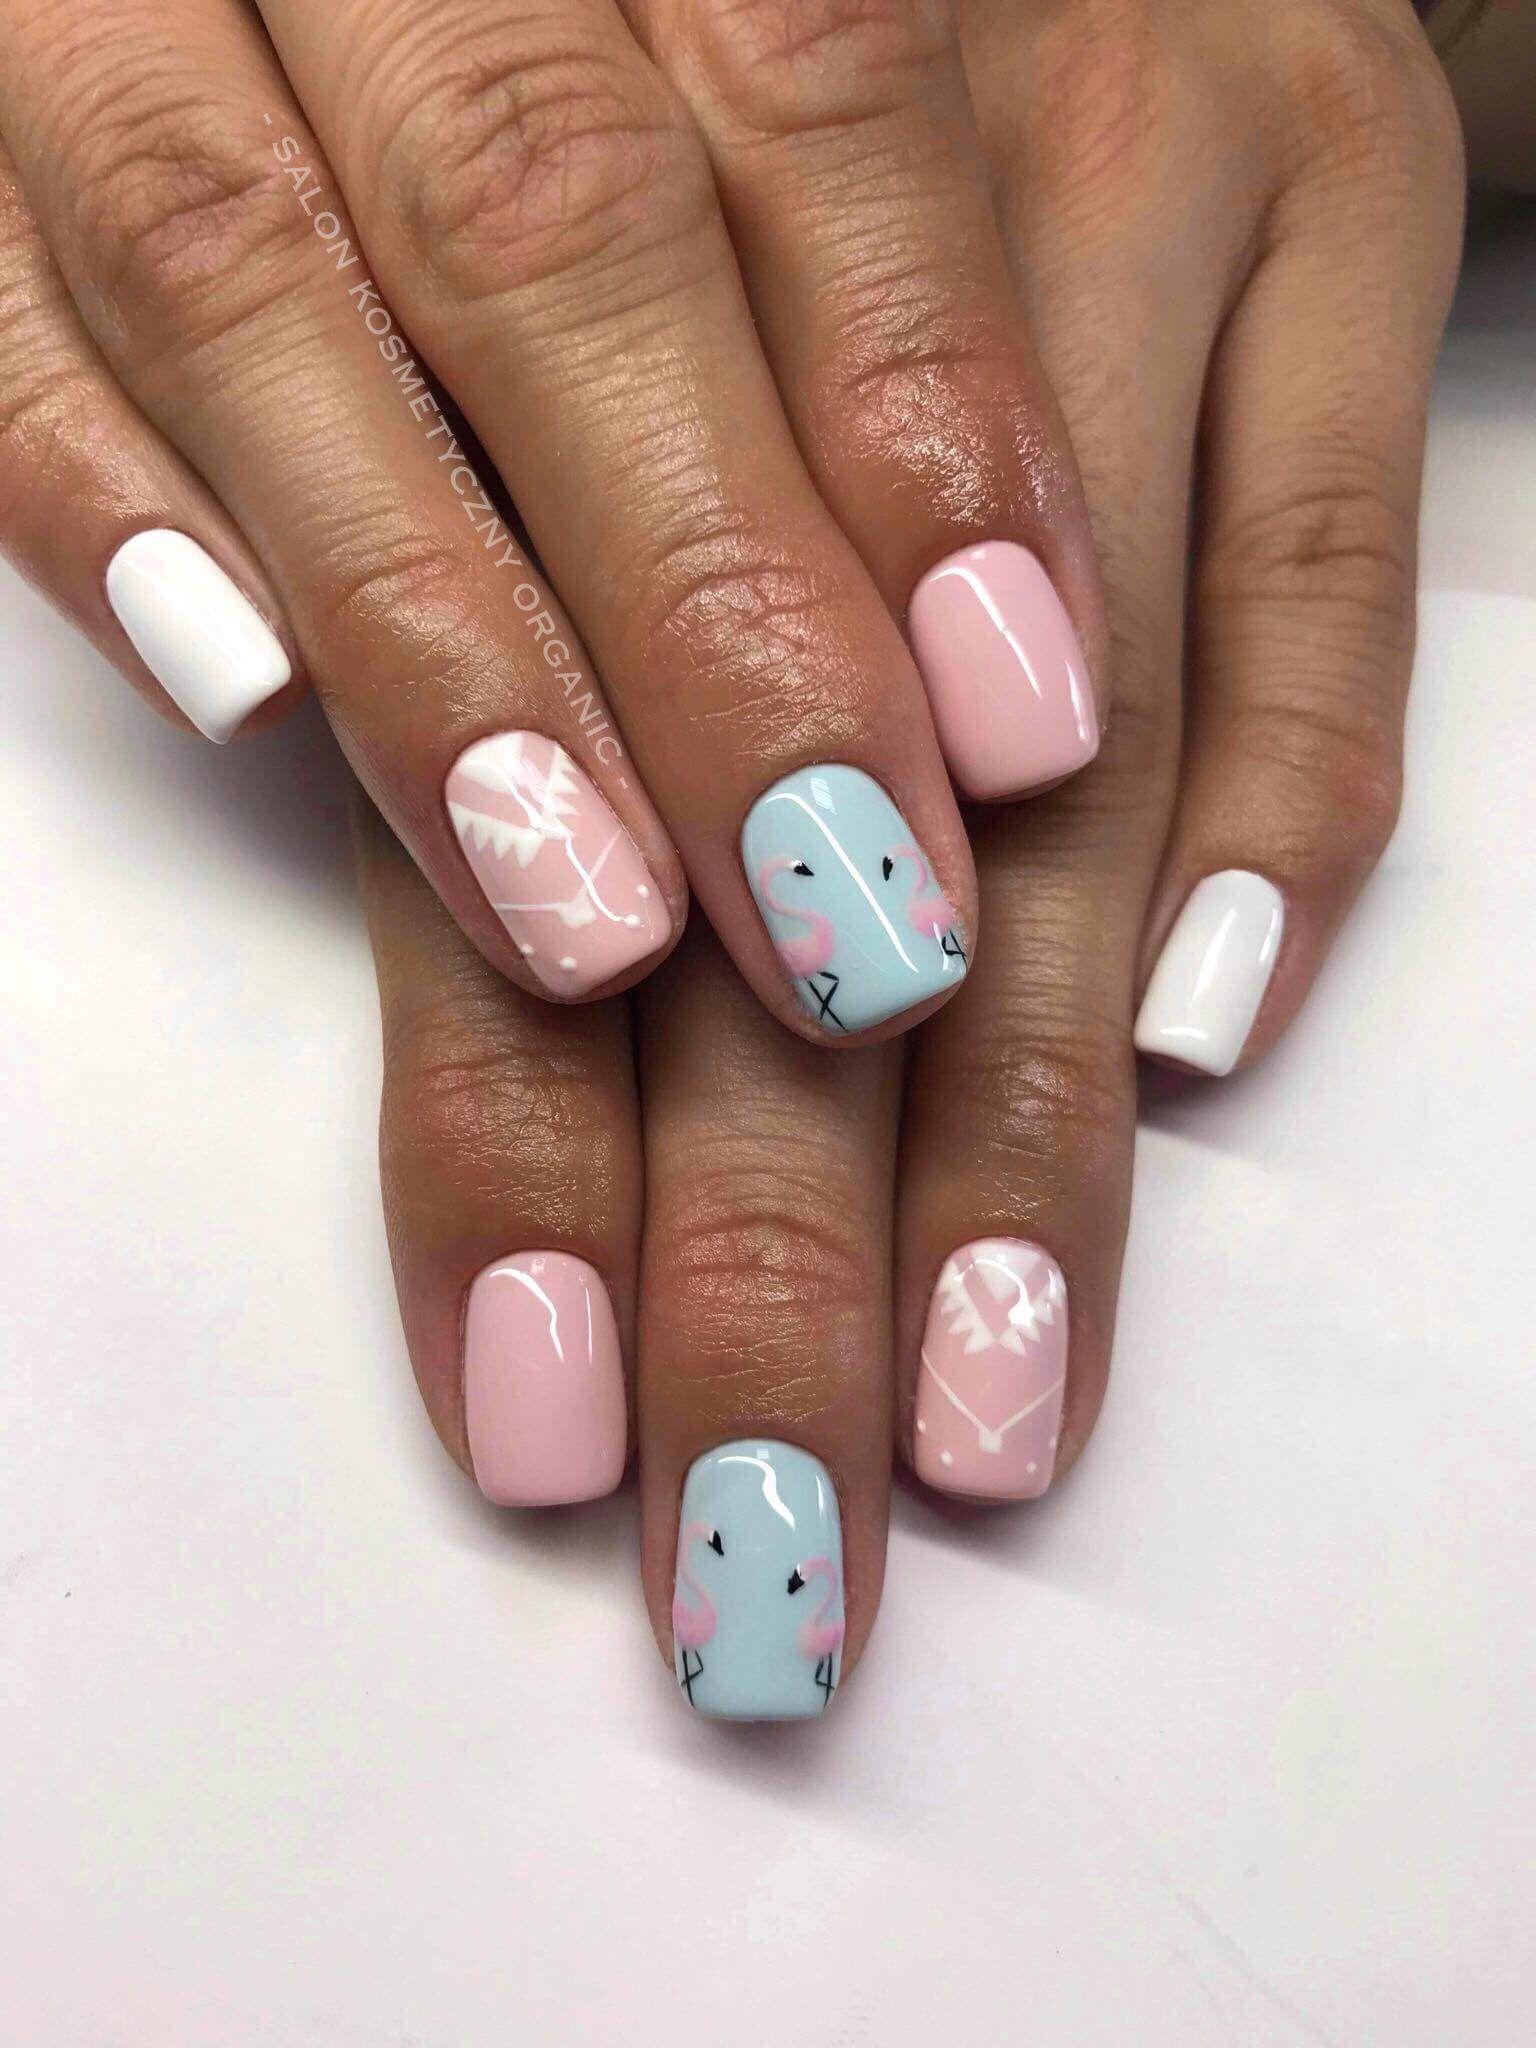 Manicure Hybrydowy Delikatny Roz Lato Flaminga Delikatne